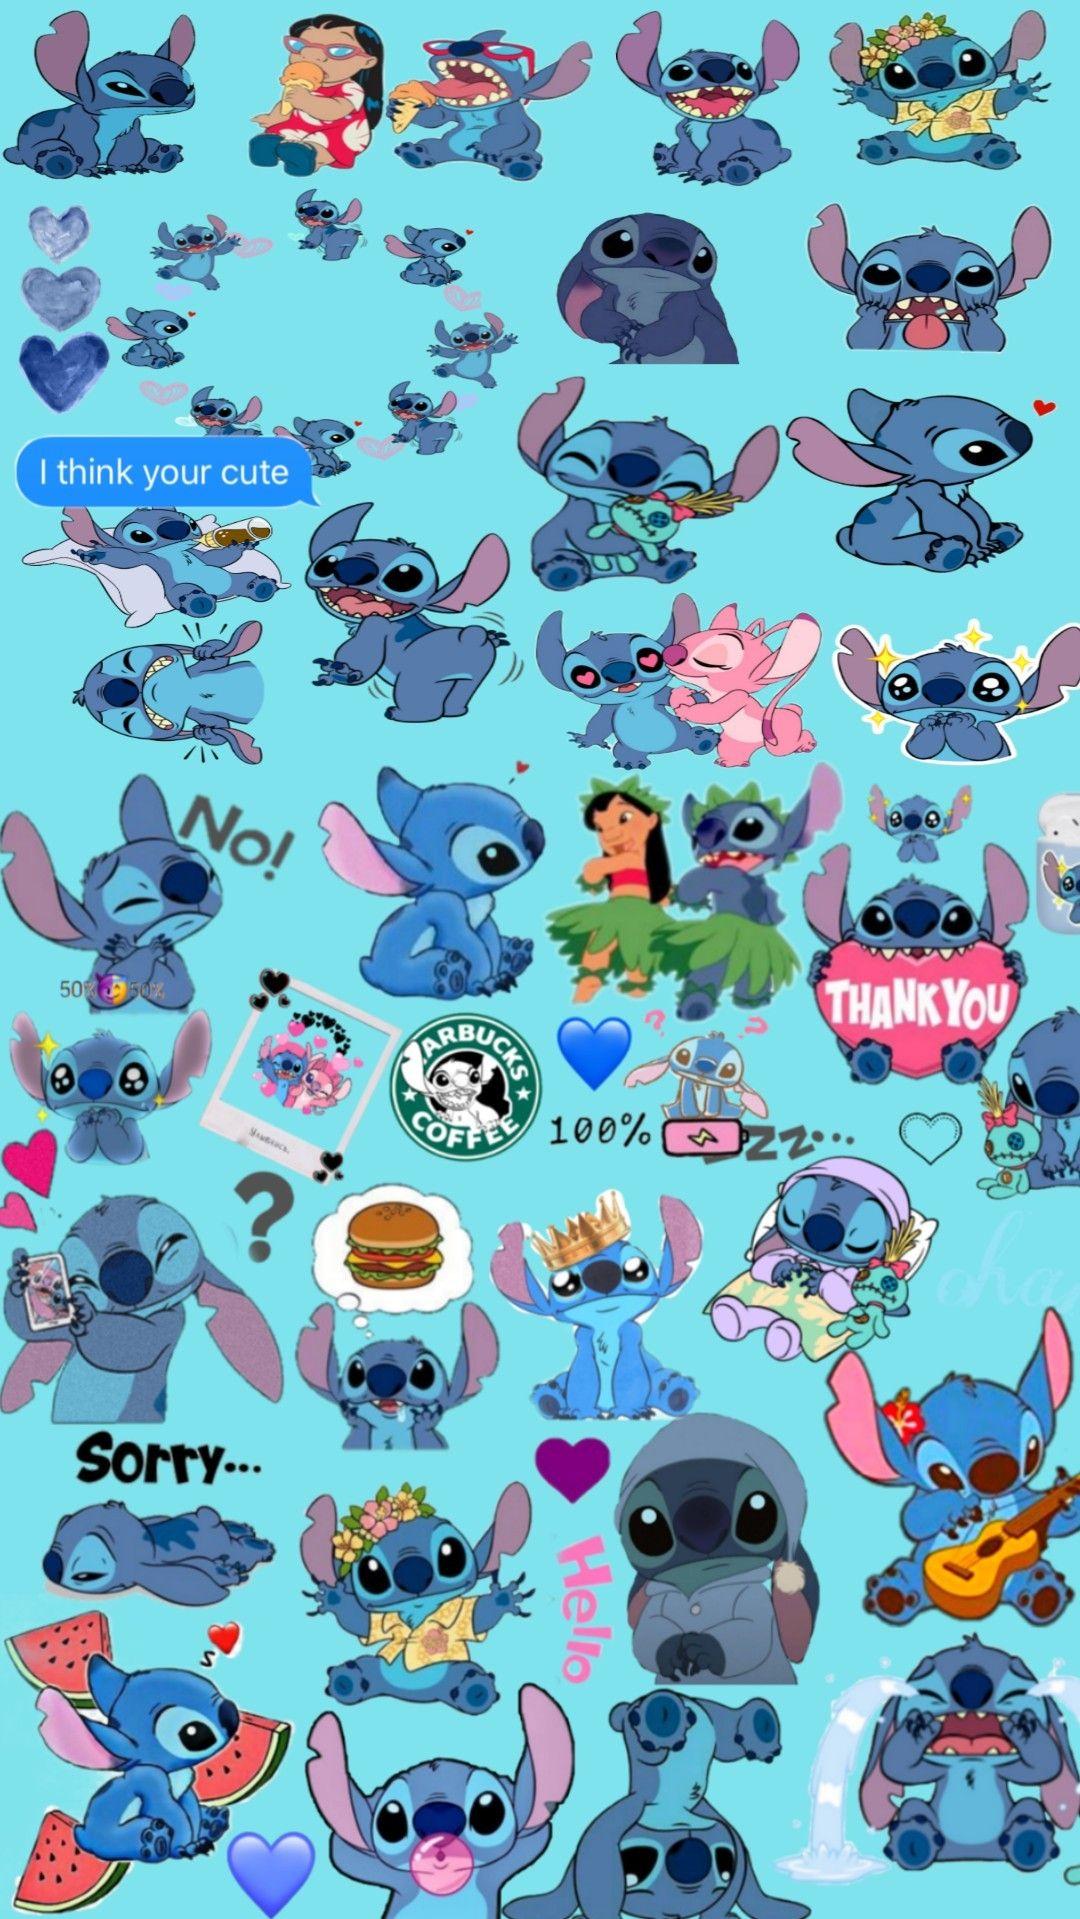 Wallpaper Cute Cartoon Wallpapers Cartoon Wallpaper Iphone Disney Collage